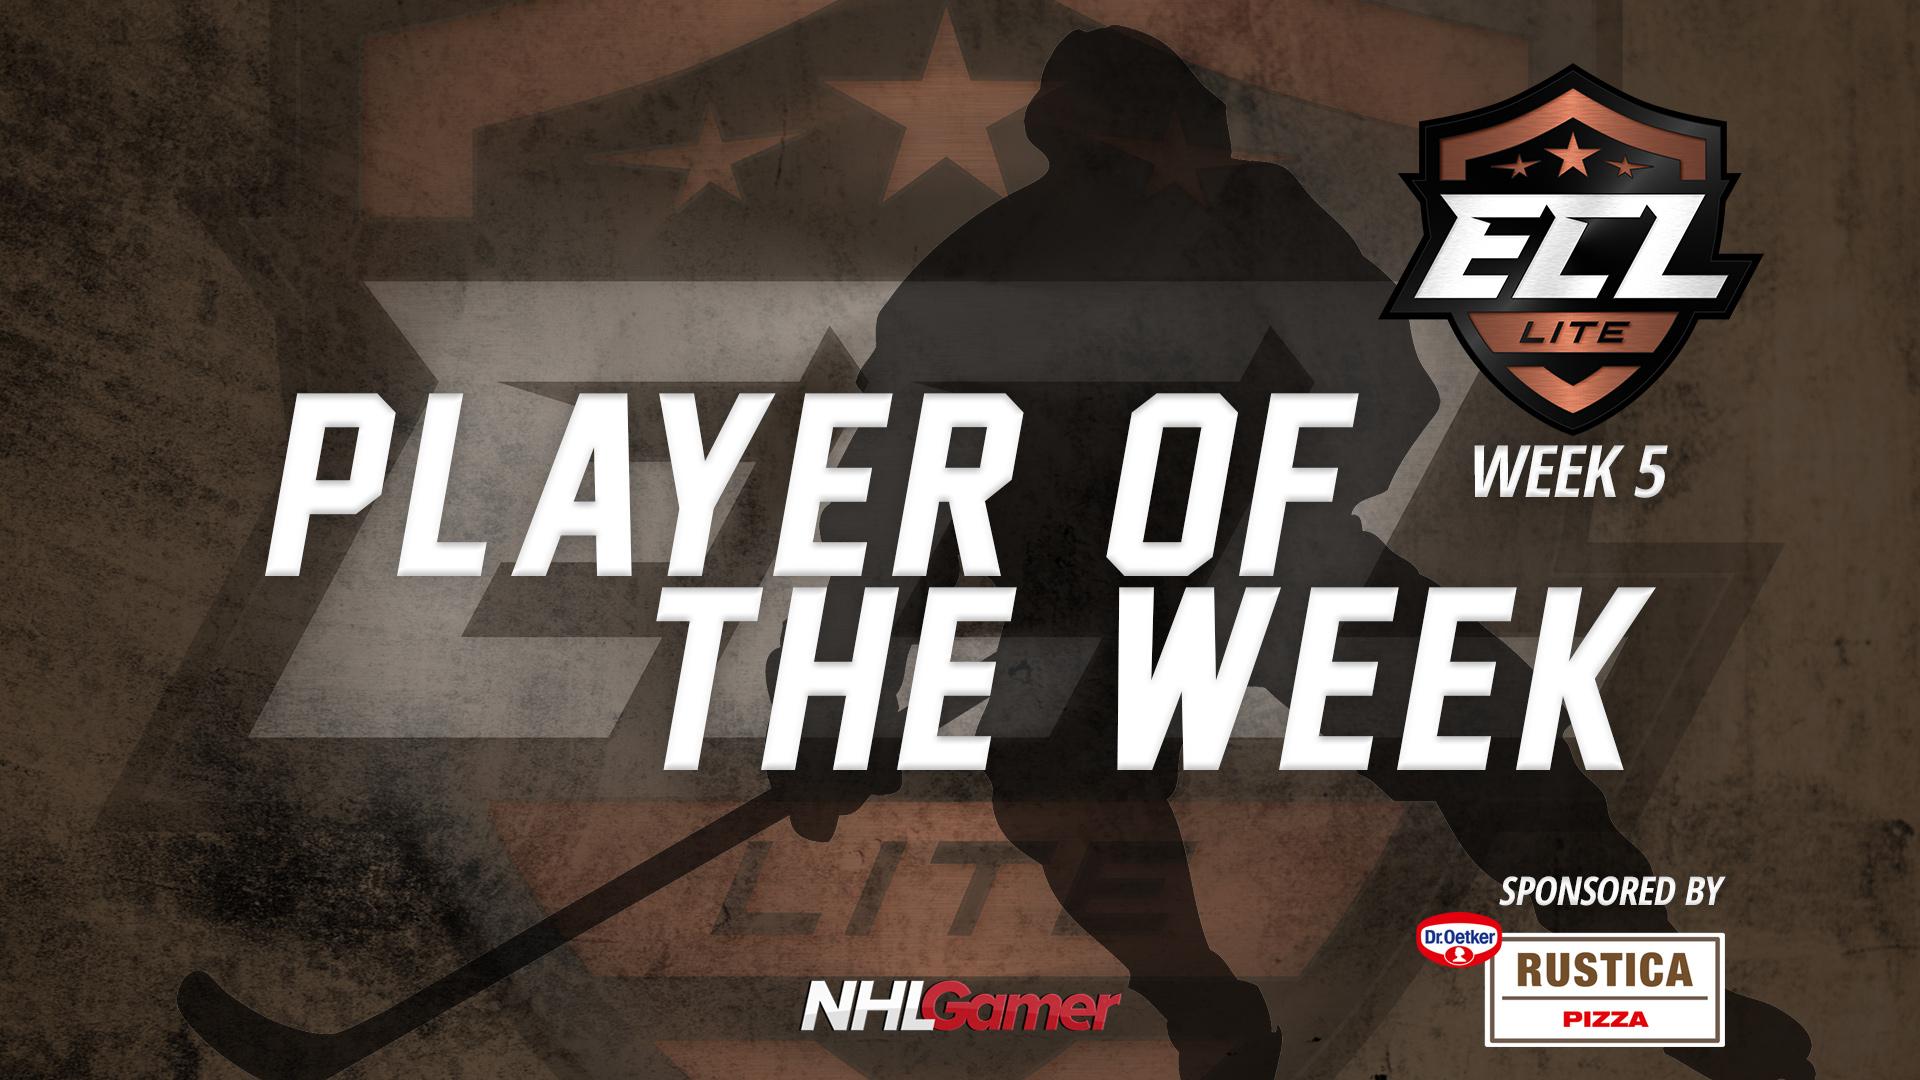 ECL_8_Lite_Player_of_the_week_5.jpg